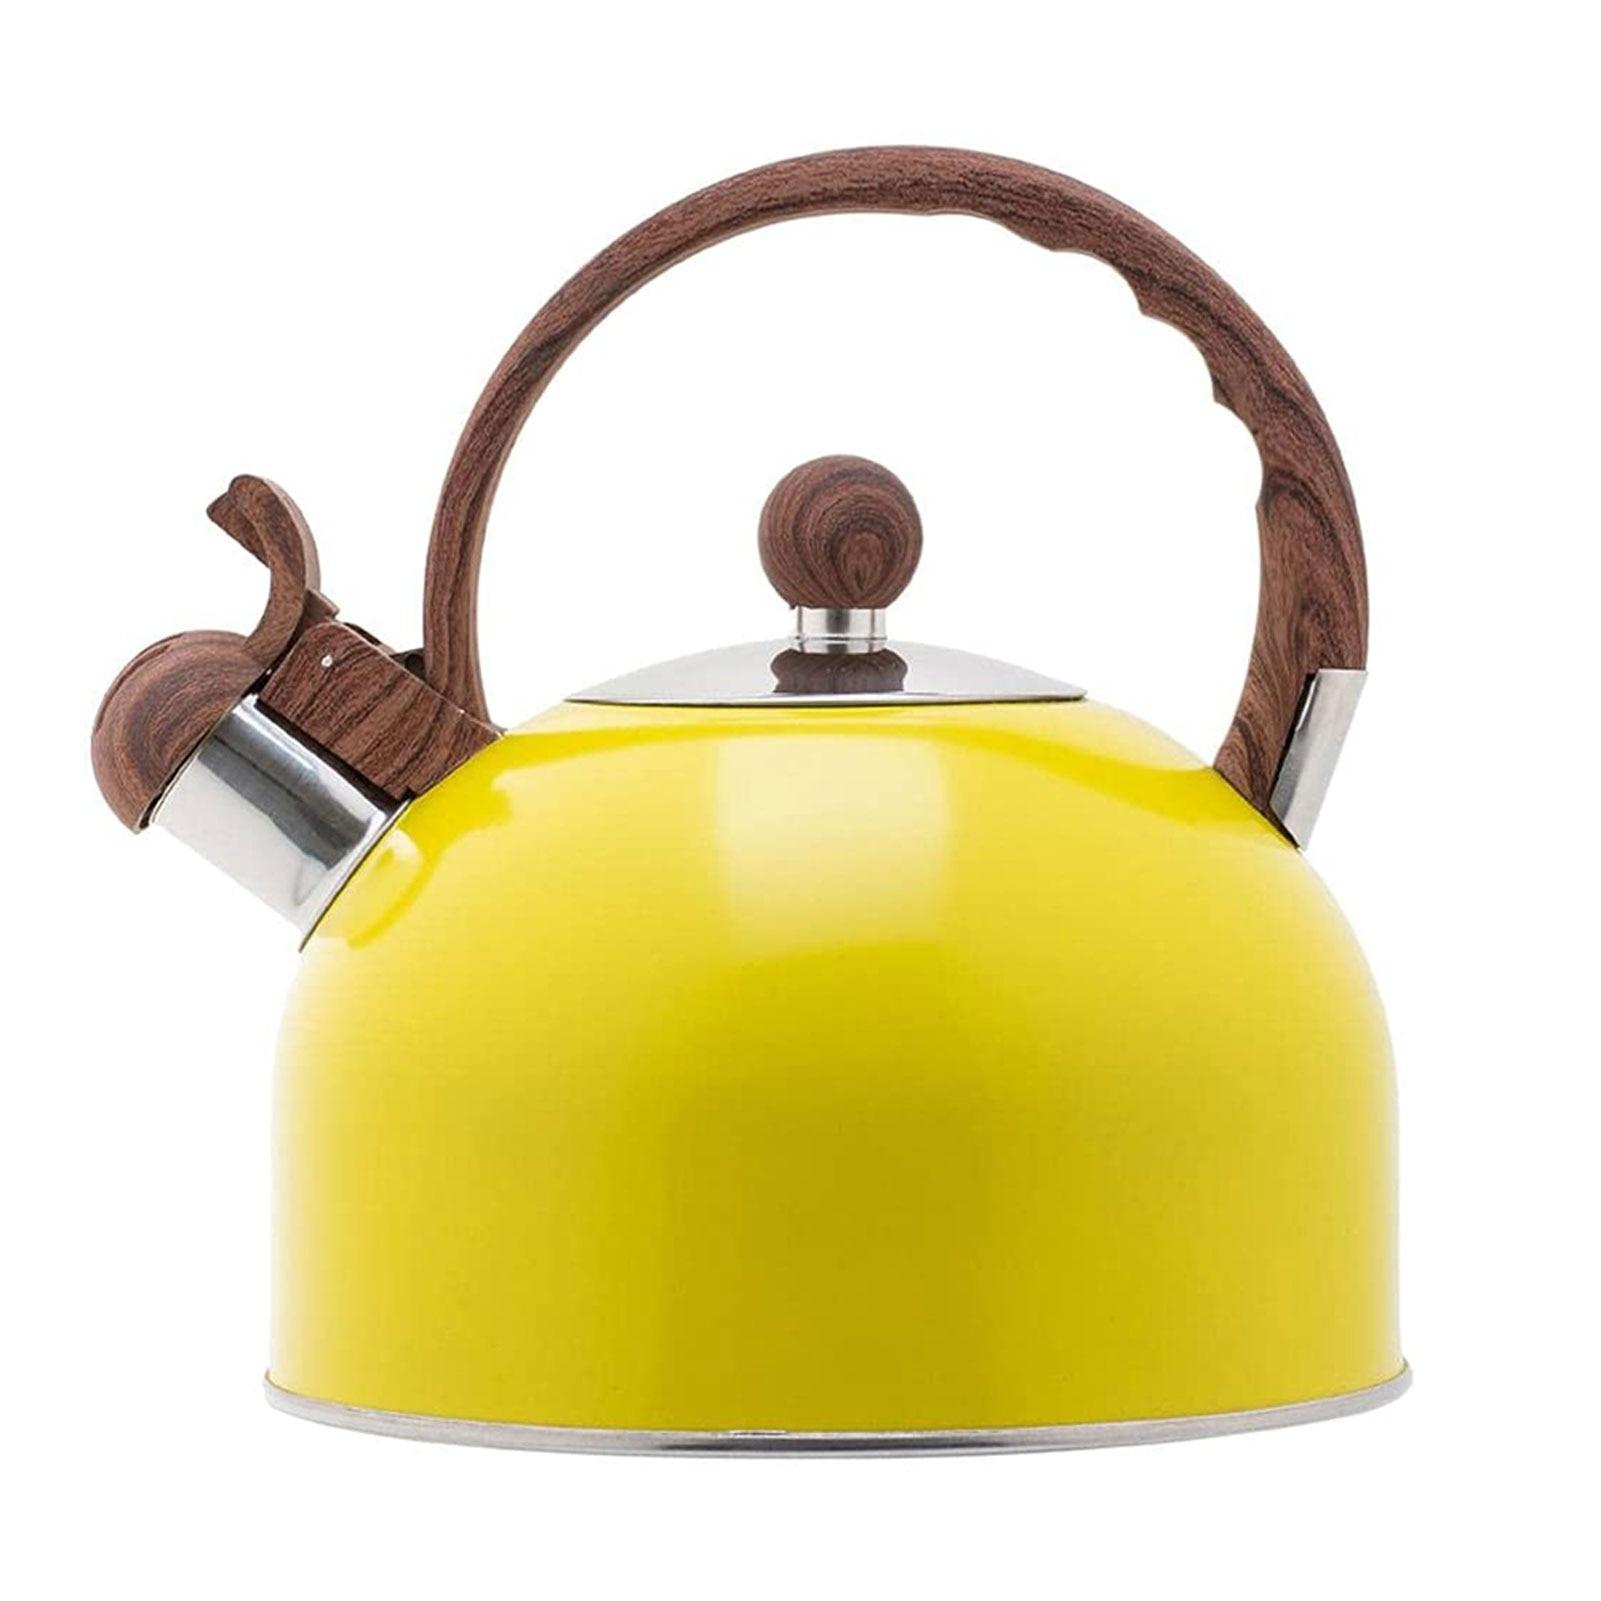 2.5L التعريفي طباخ الشاي المطبخ دائم الفولاذ المقاوم للصدأ صفير غلاية مع مقبض هدية آمنة خفيفة الوزن موقد غاز المنزل